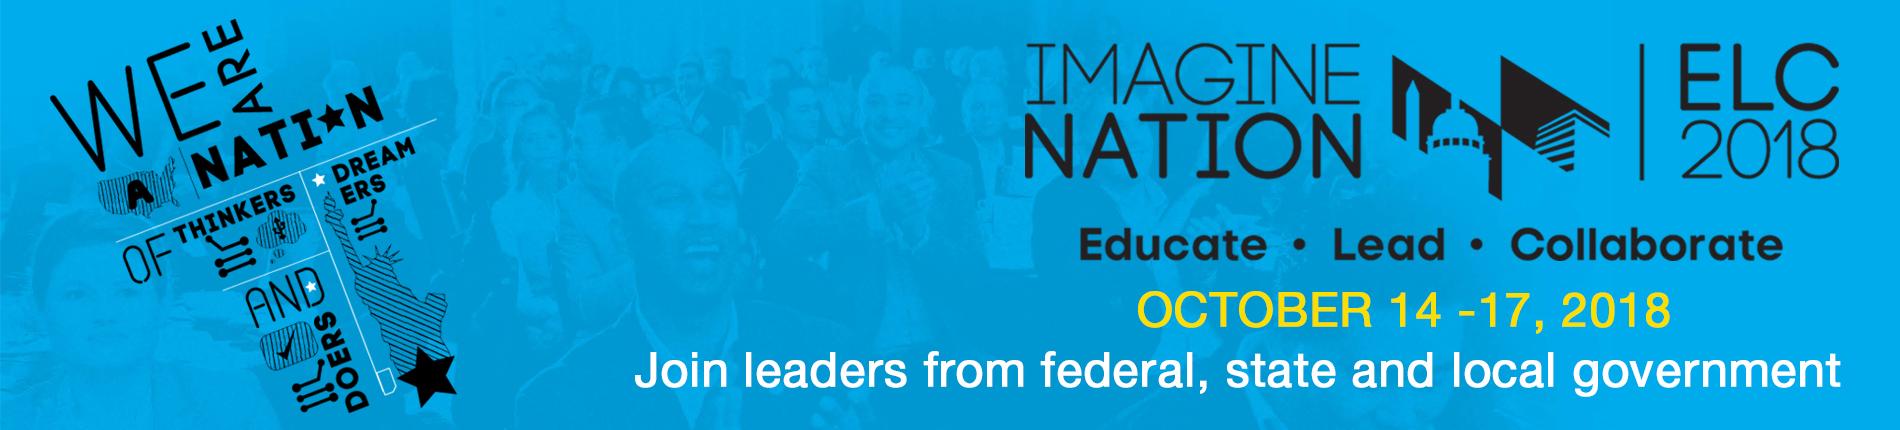 ACT-IAC Imagine Nation ELC 2018